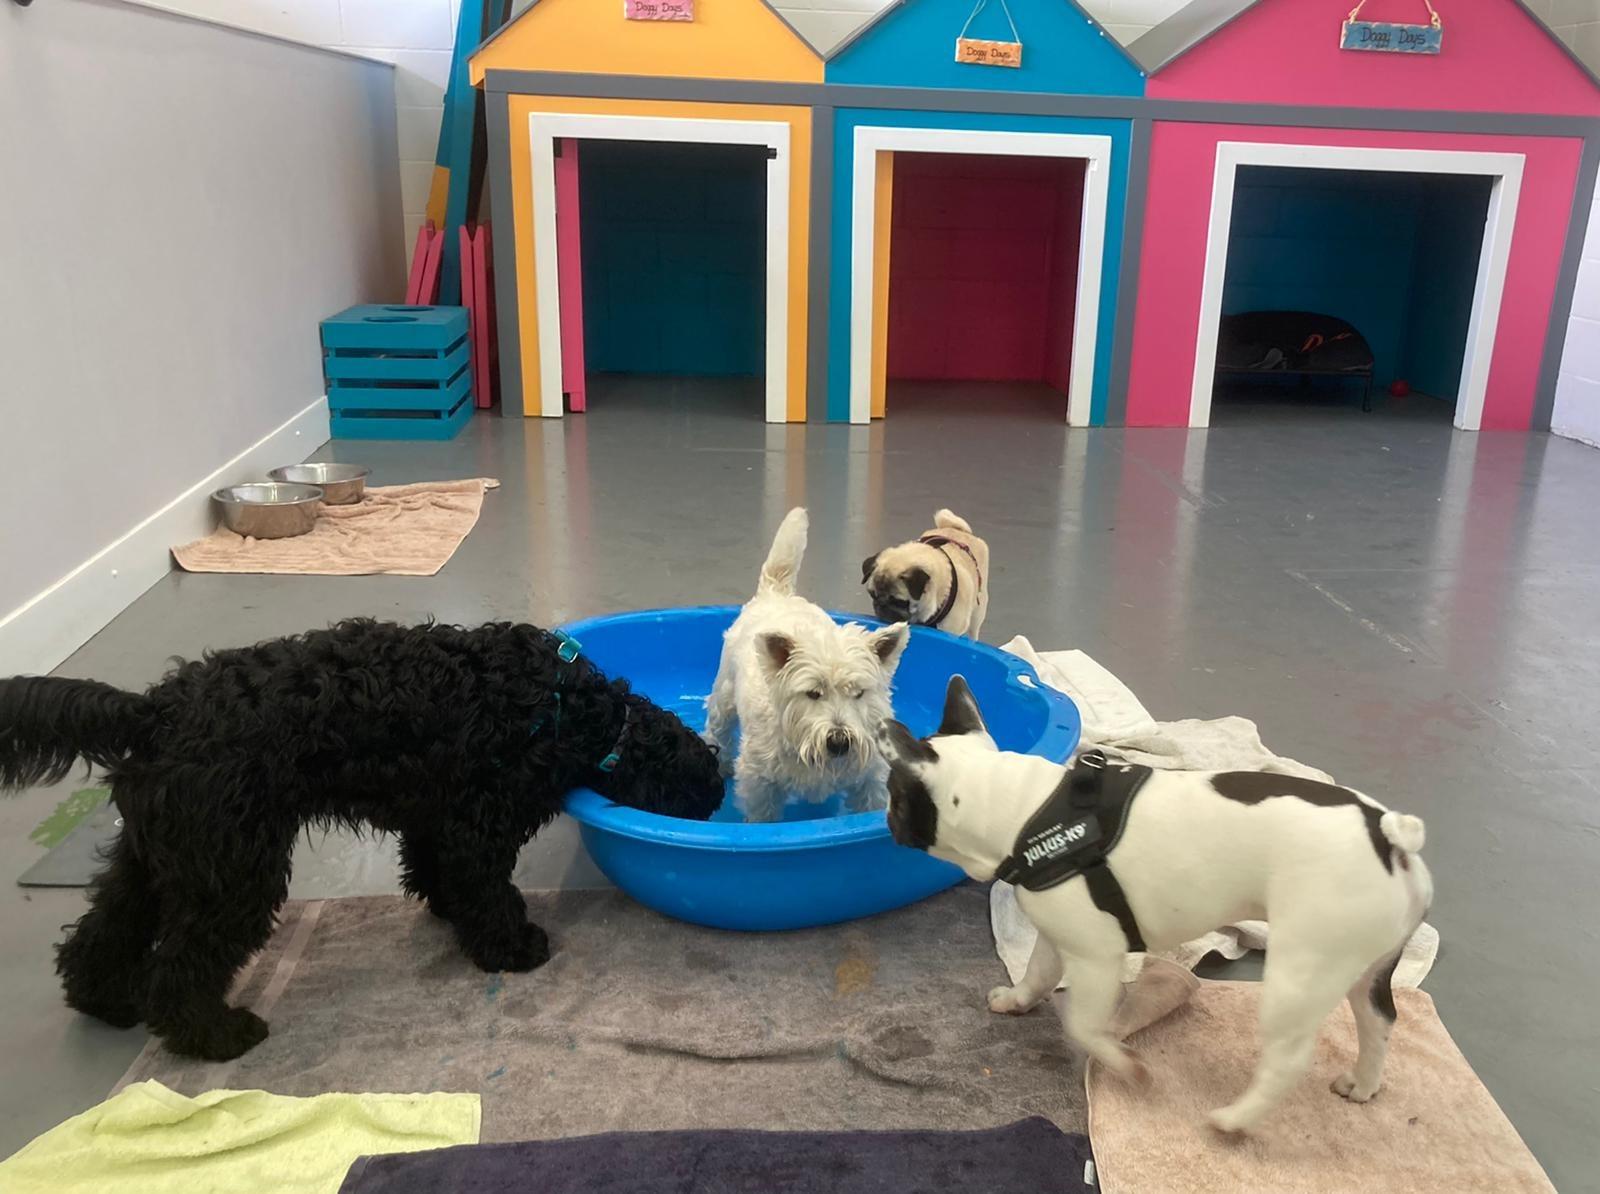 Doggy Days Grooming Salon